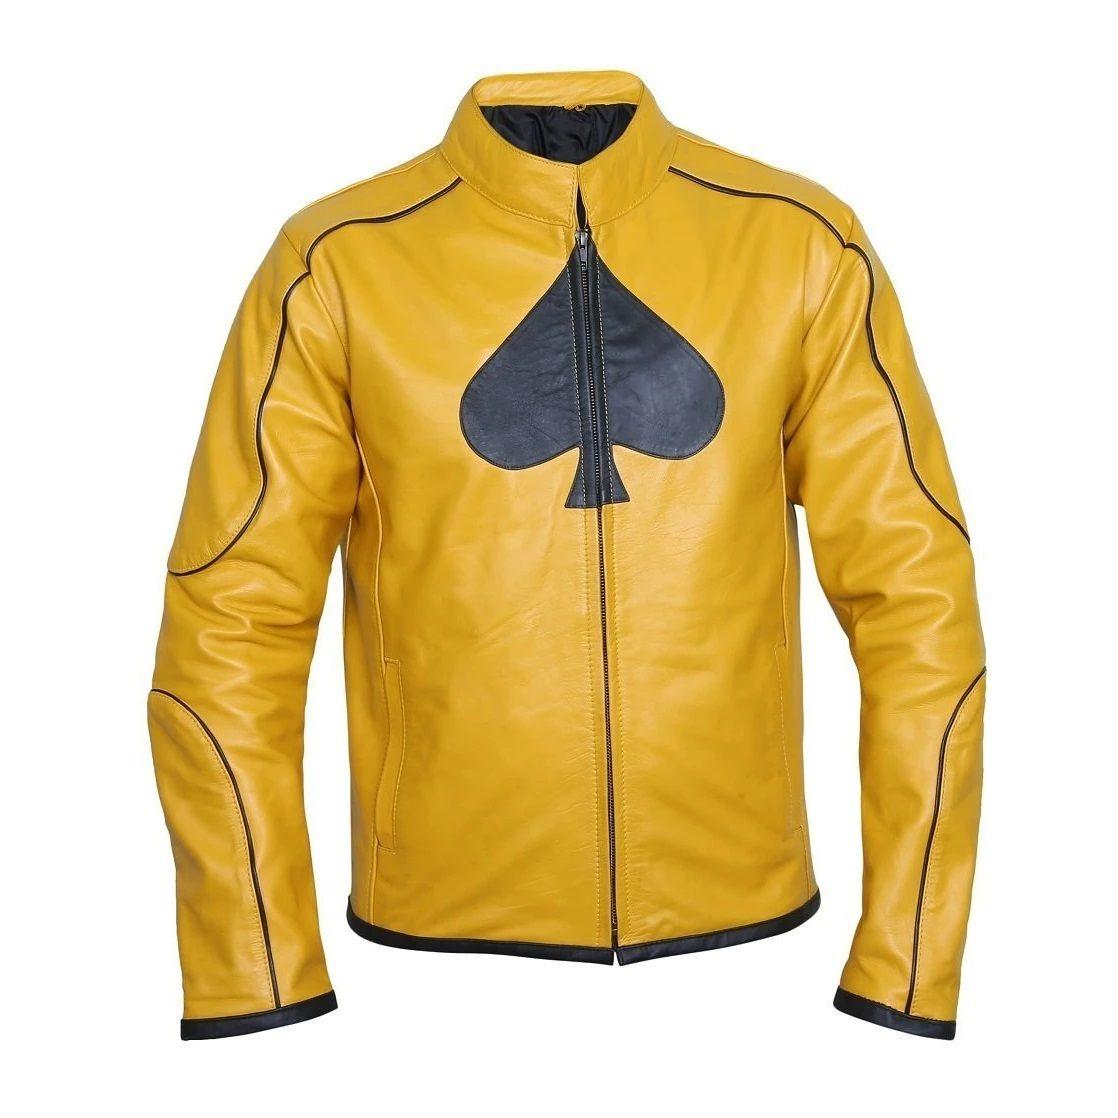 Classy Dijon Mustard Yellow Leather Jacket Best Leather Jackets Casual Leather Jacket Coloured Leather Jacket [ 1118 x 1118 Pixel ]